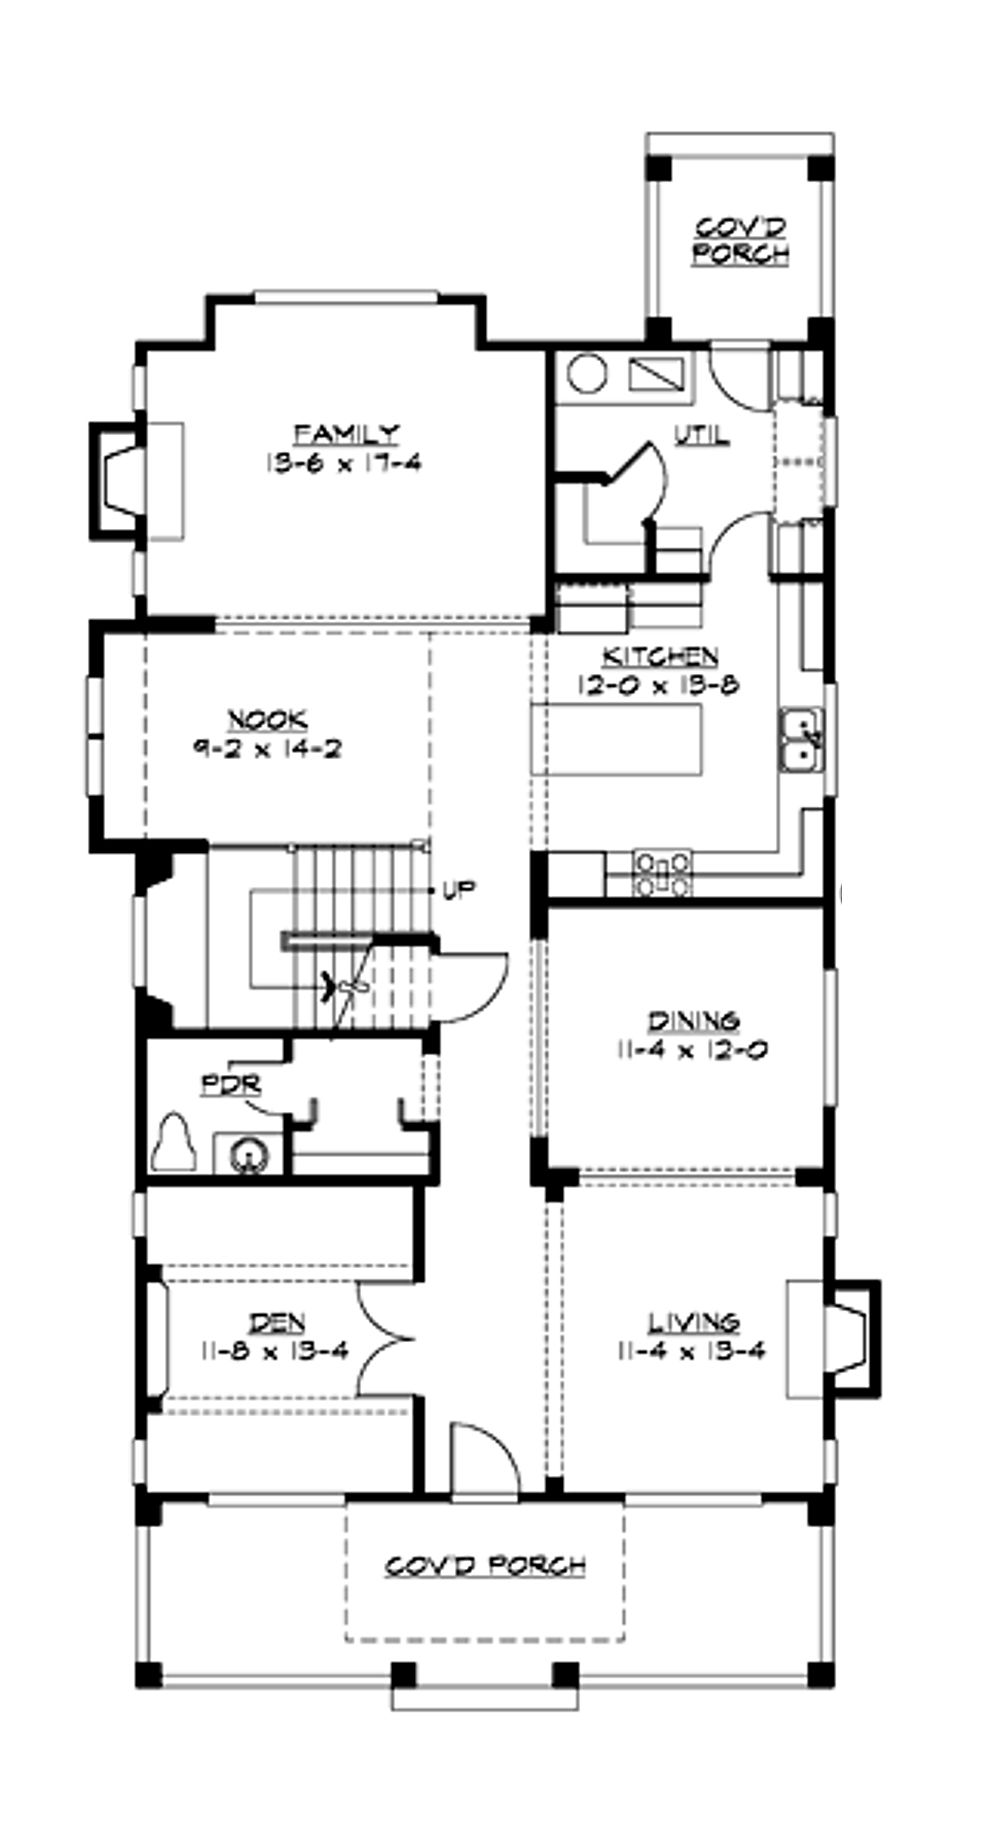 Main floor plan for narrow lot design.